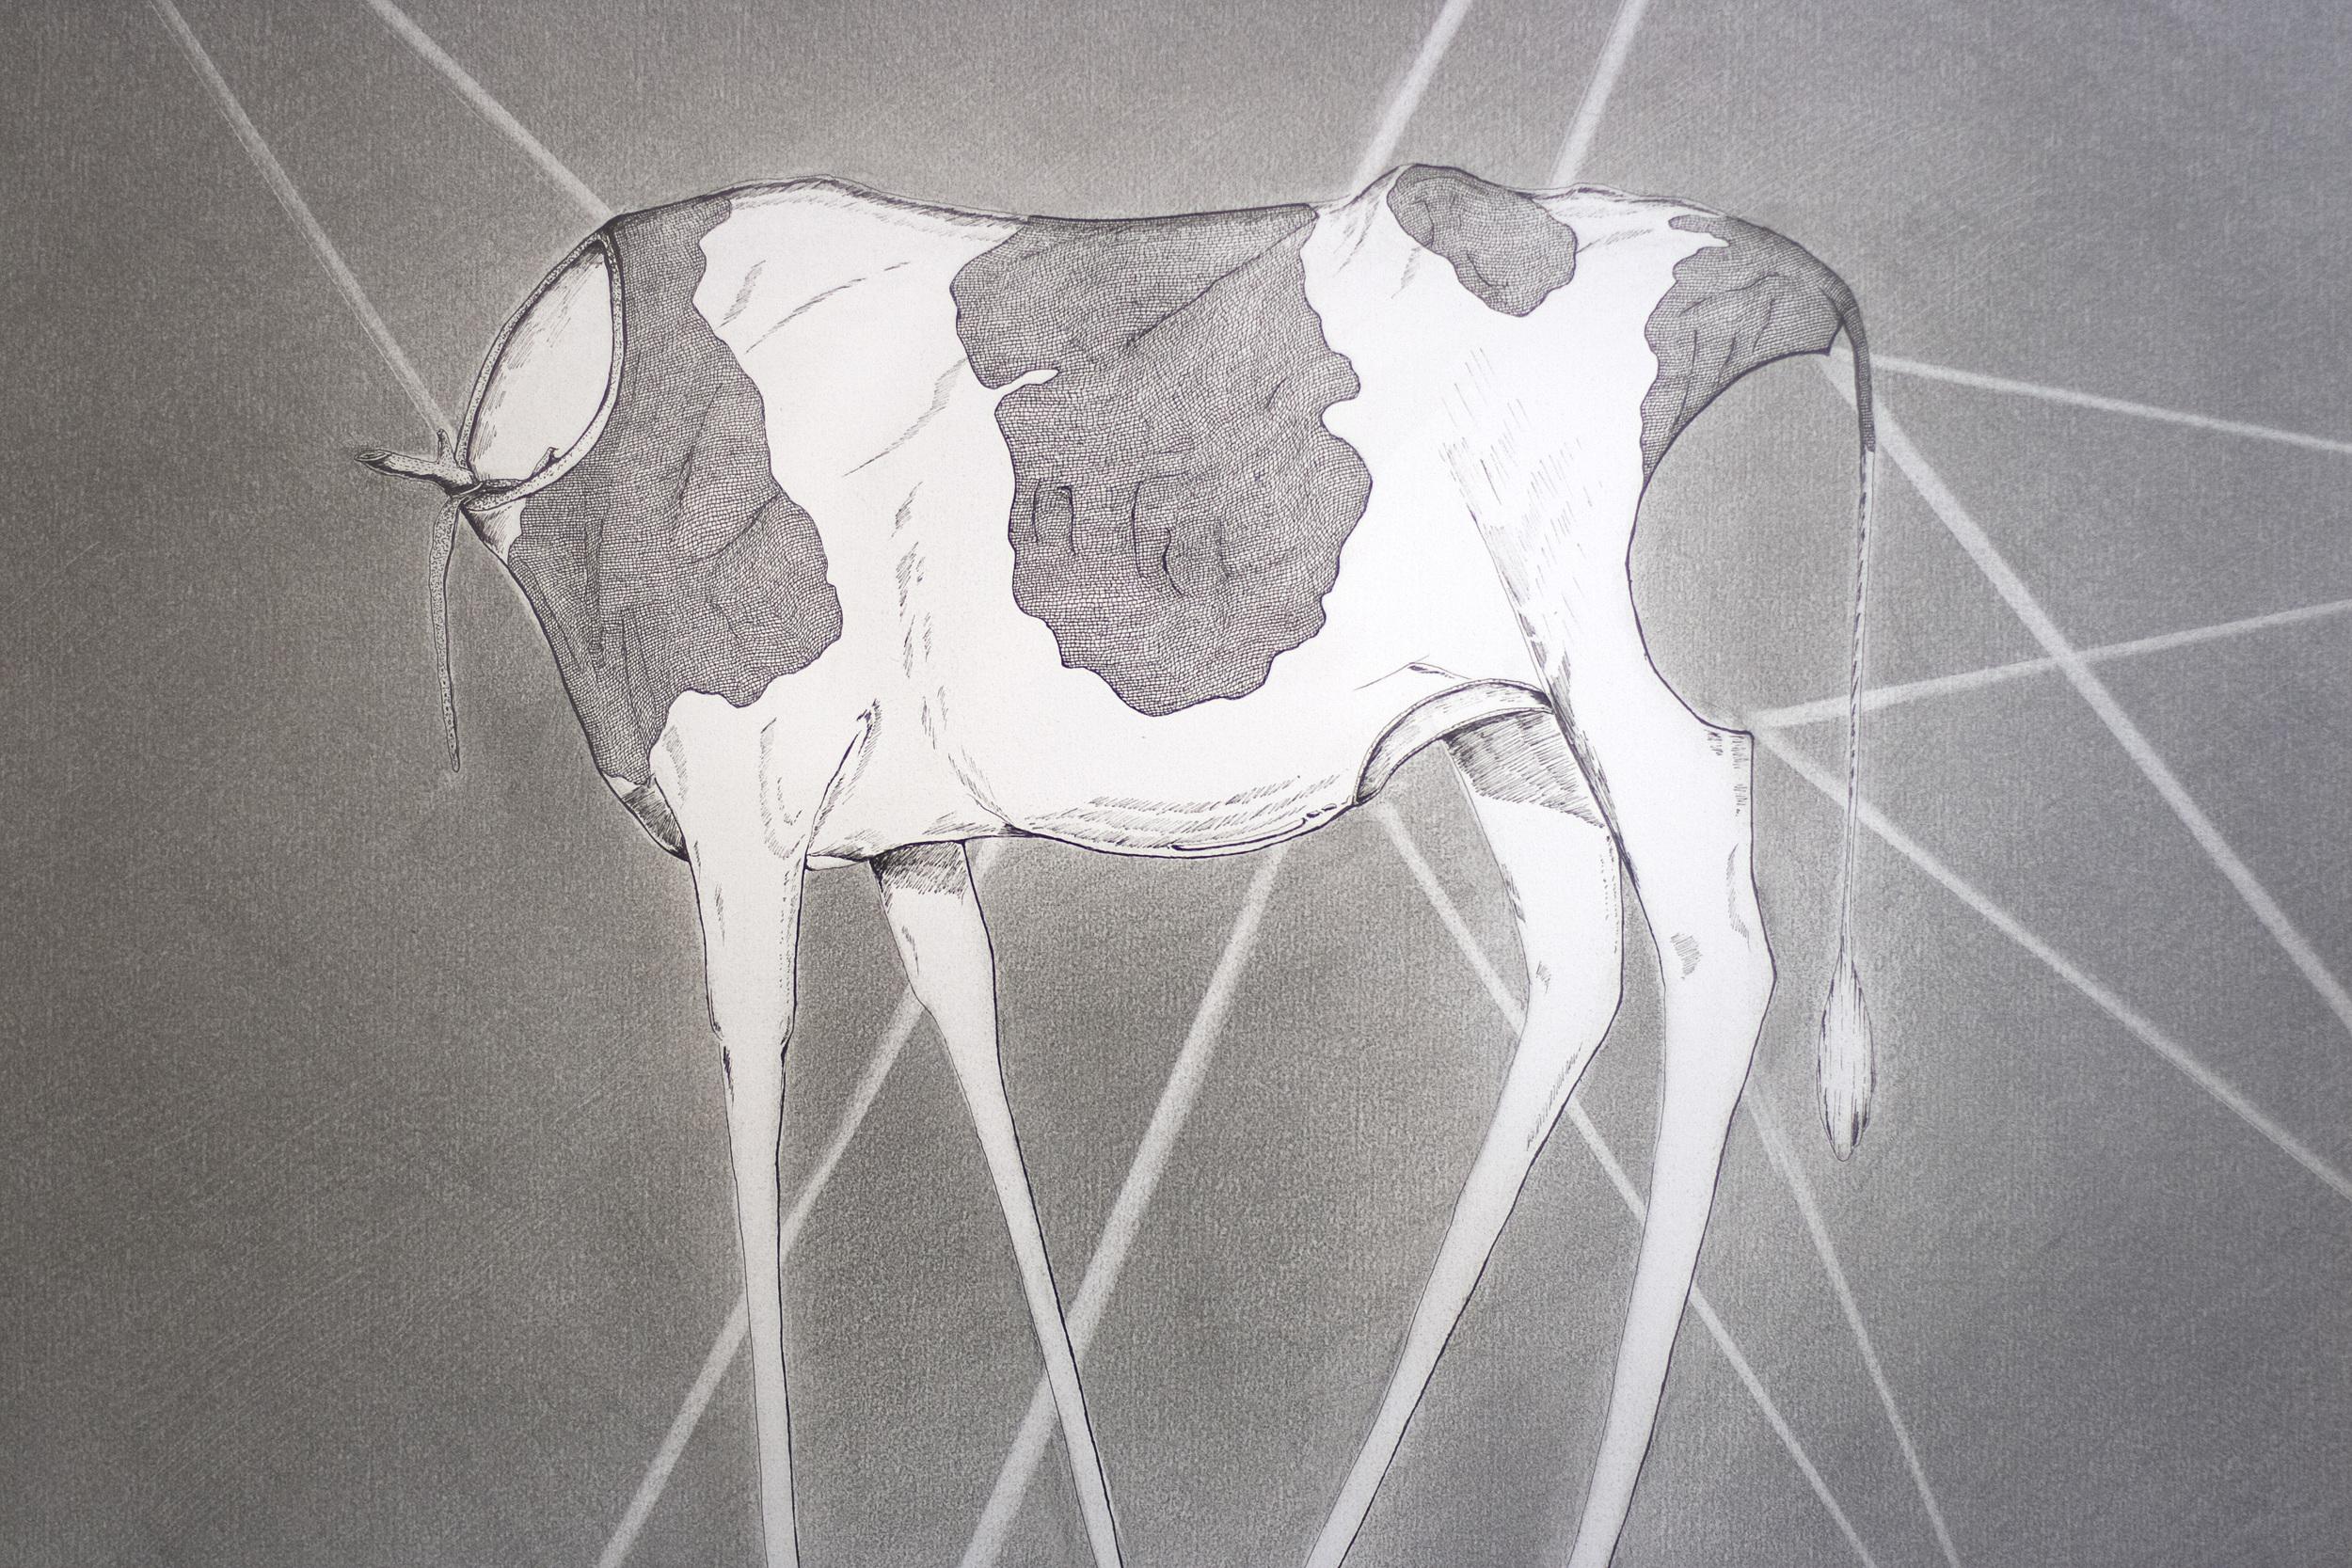 Cow_Mutilation Antlers2_50x46cm.jpg